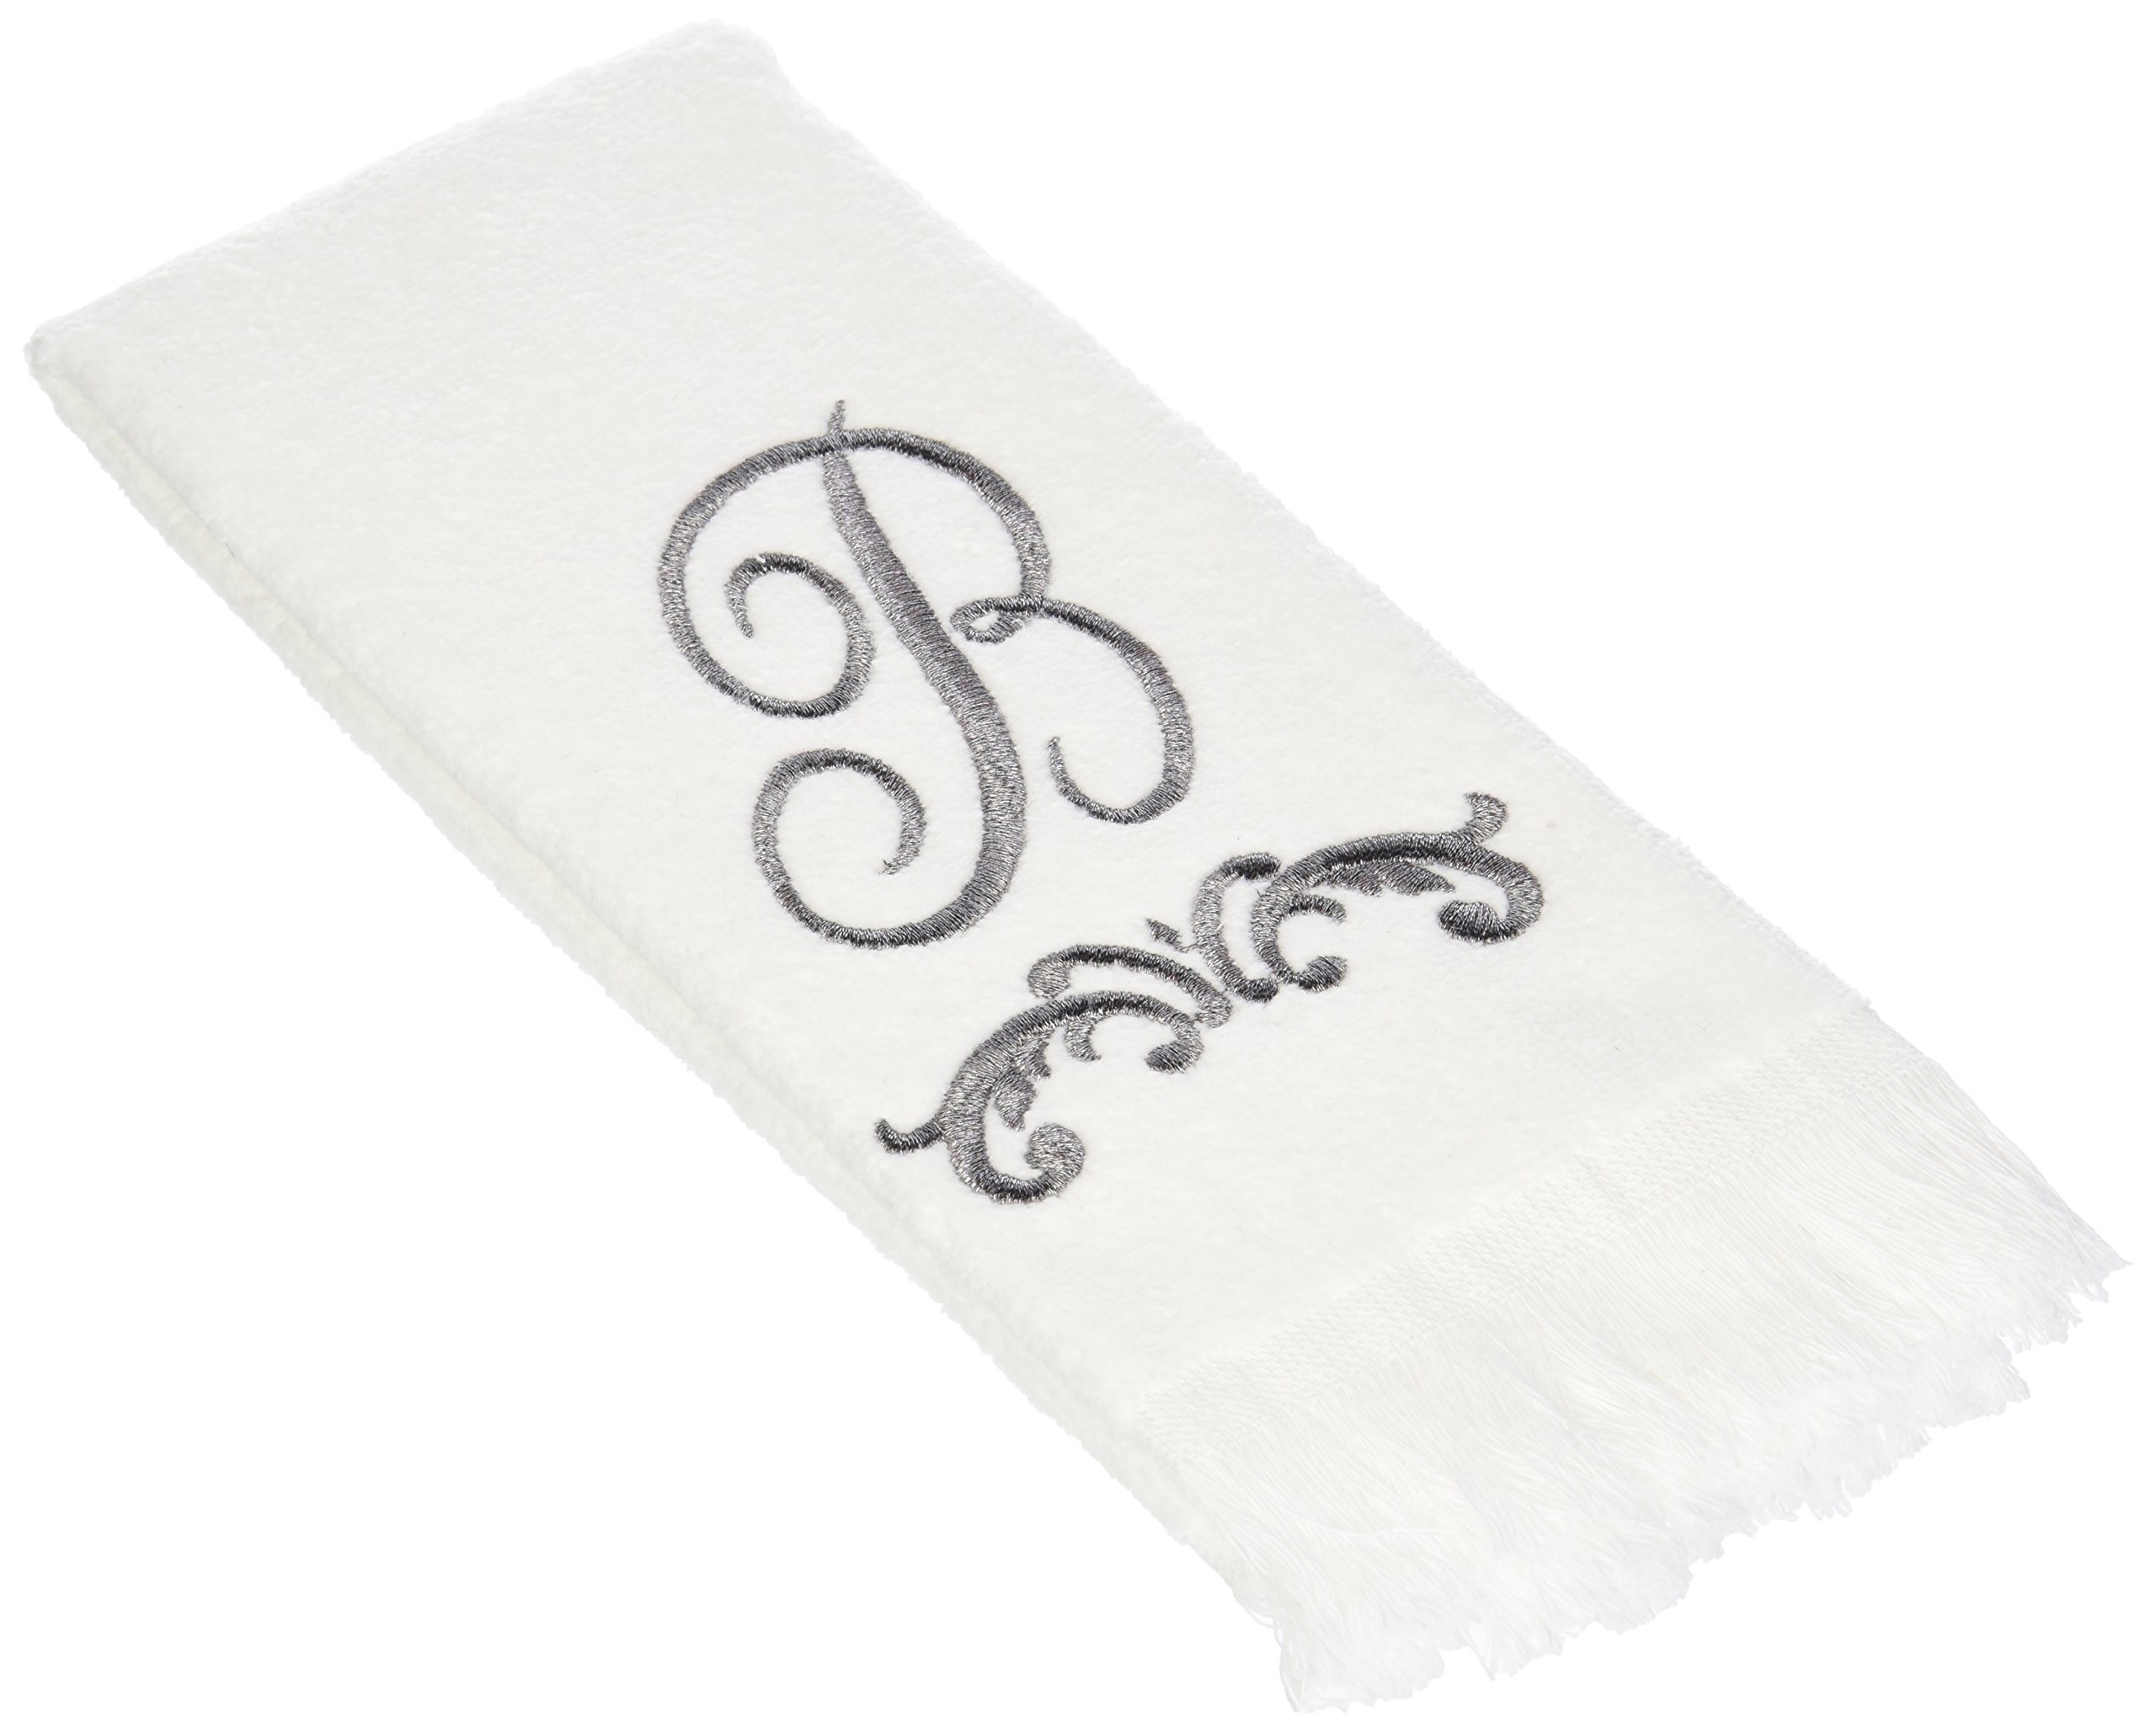 Avanti Monogram Fingertip Towel, P-Scroll, White/Pewter